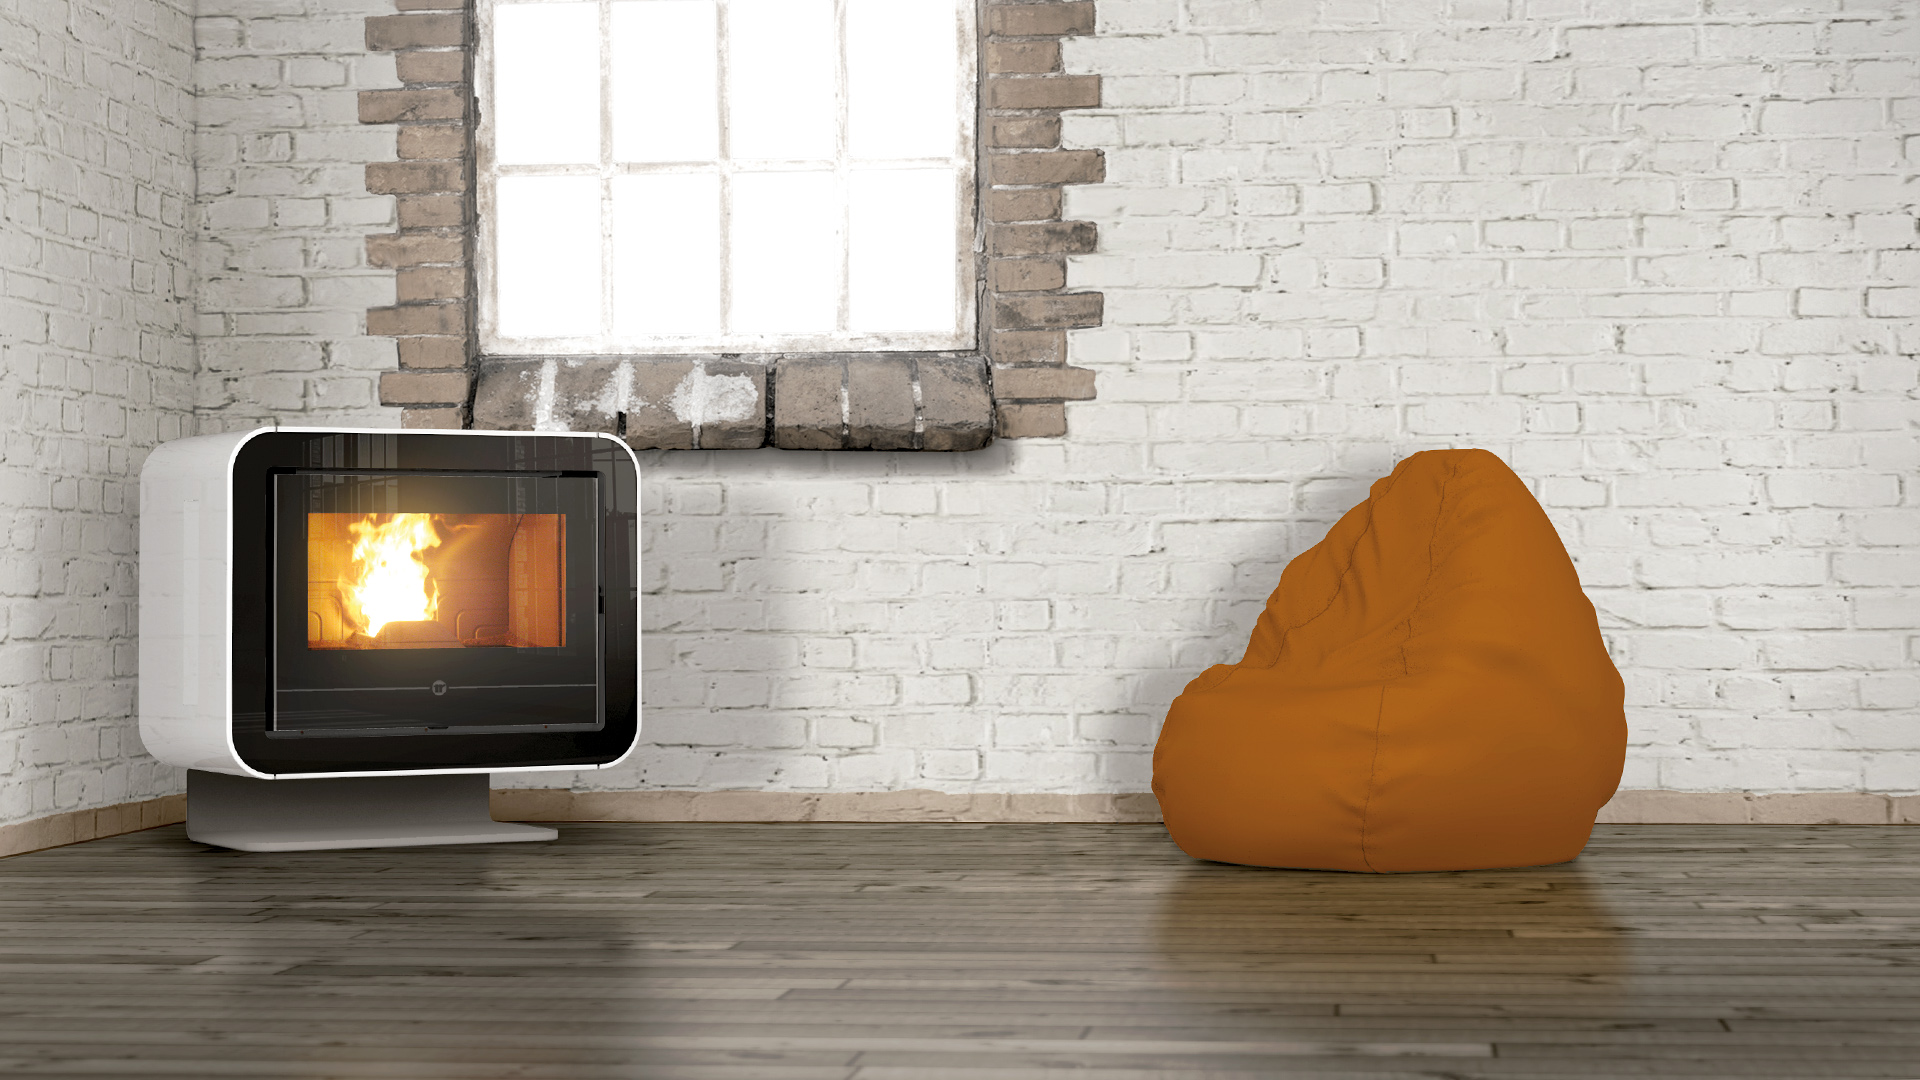 pellet einbauofen online kaufen i thermoworld ofenshop. Black Bedroom Furniture Sets. Home Design Ideas